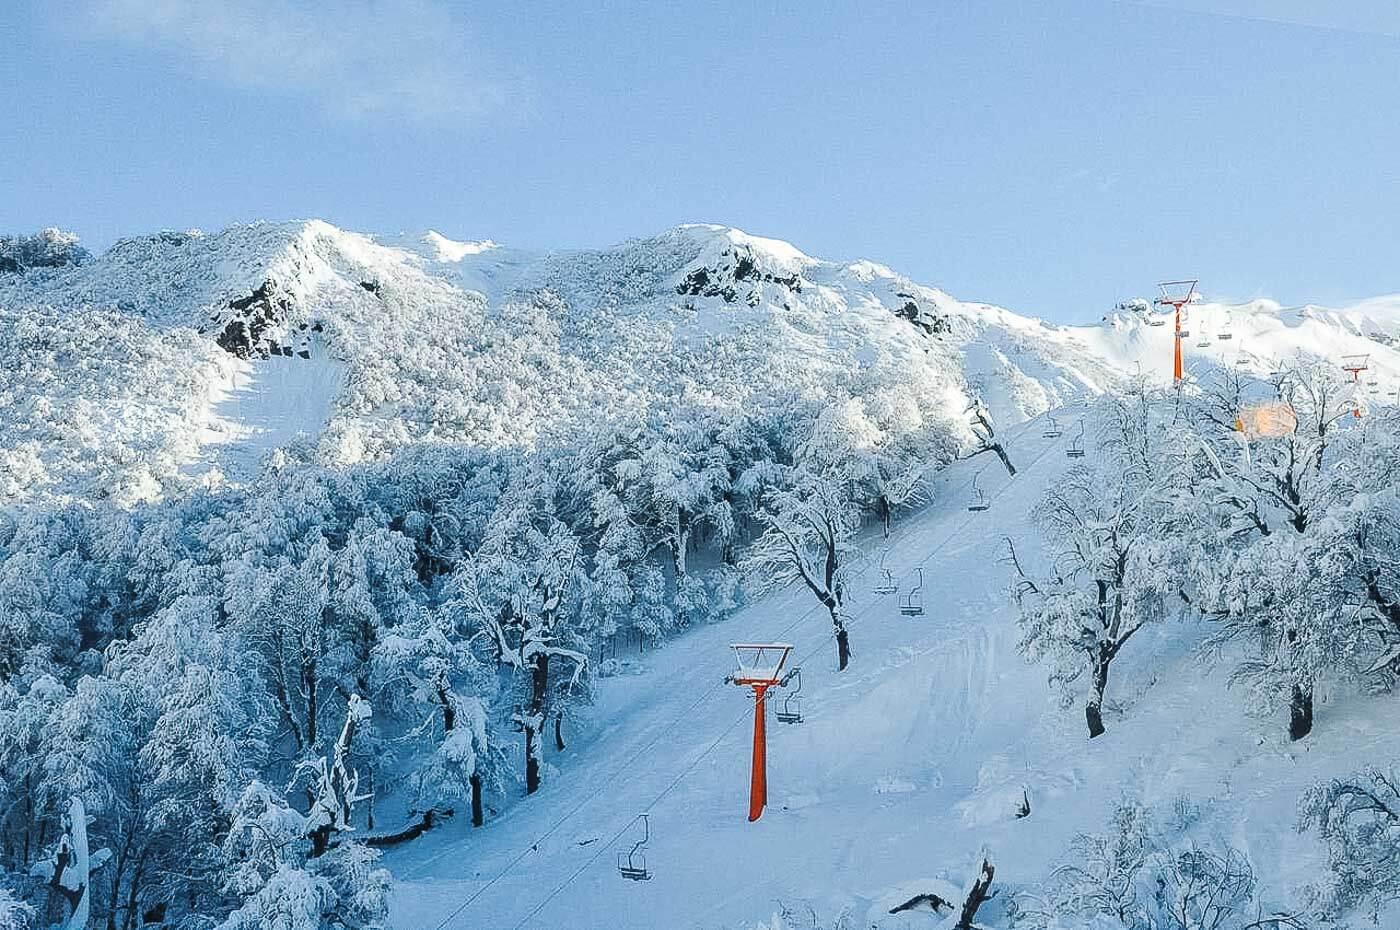 O que fazer em Chillán Neve Termas de Chillán - Neve 2